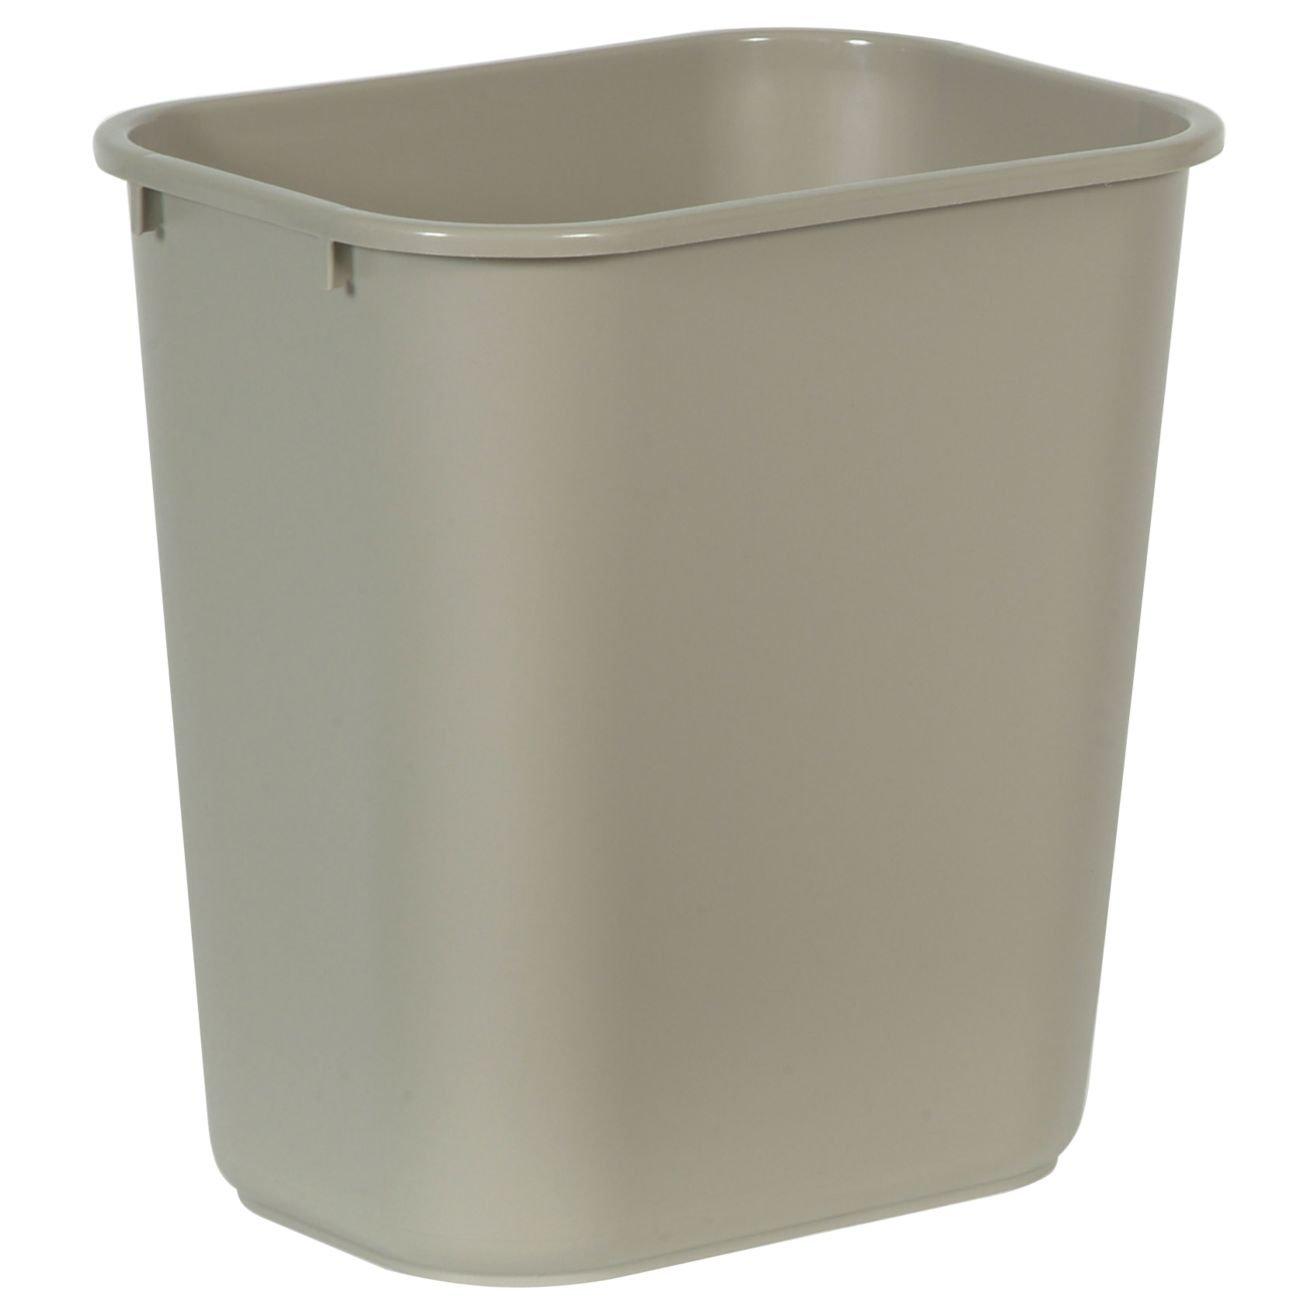 Rubbermaid Kitchen Trash Cans #33: Rubbermaid Commercial Plastic 7-Gallon Trash Can, Beige: Waste Bins: Amazon.com: Industrial U0026amp; Scientific